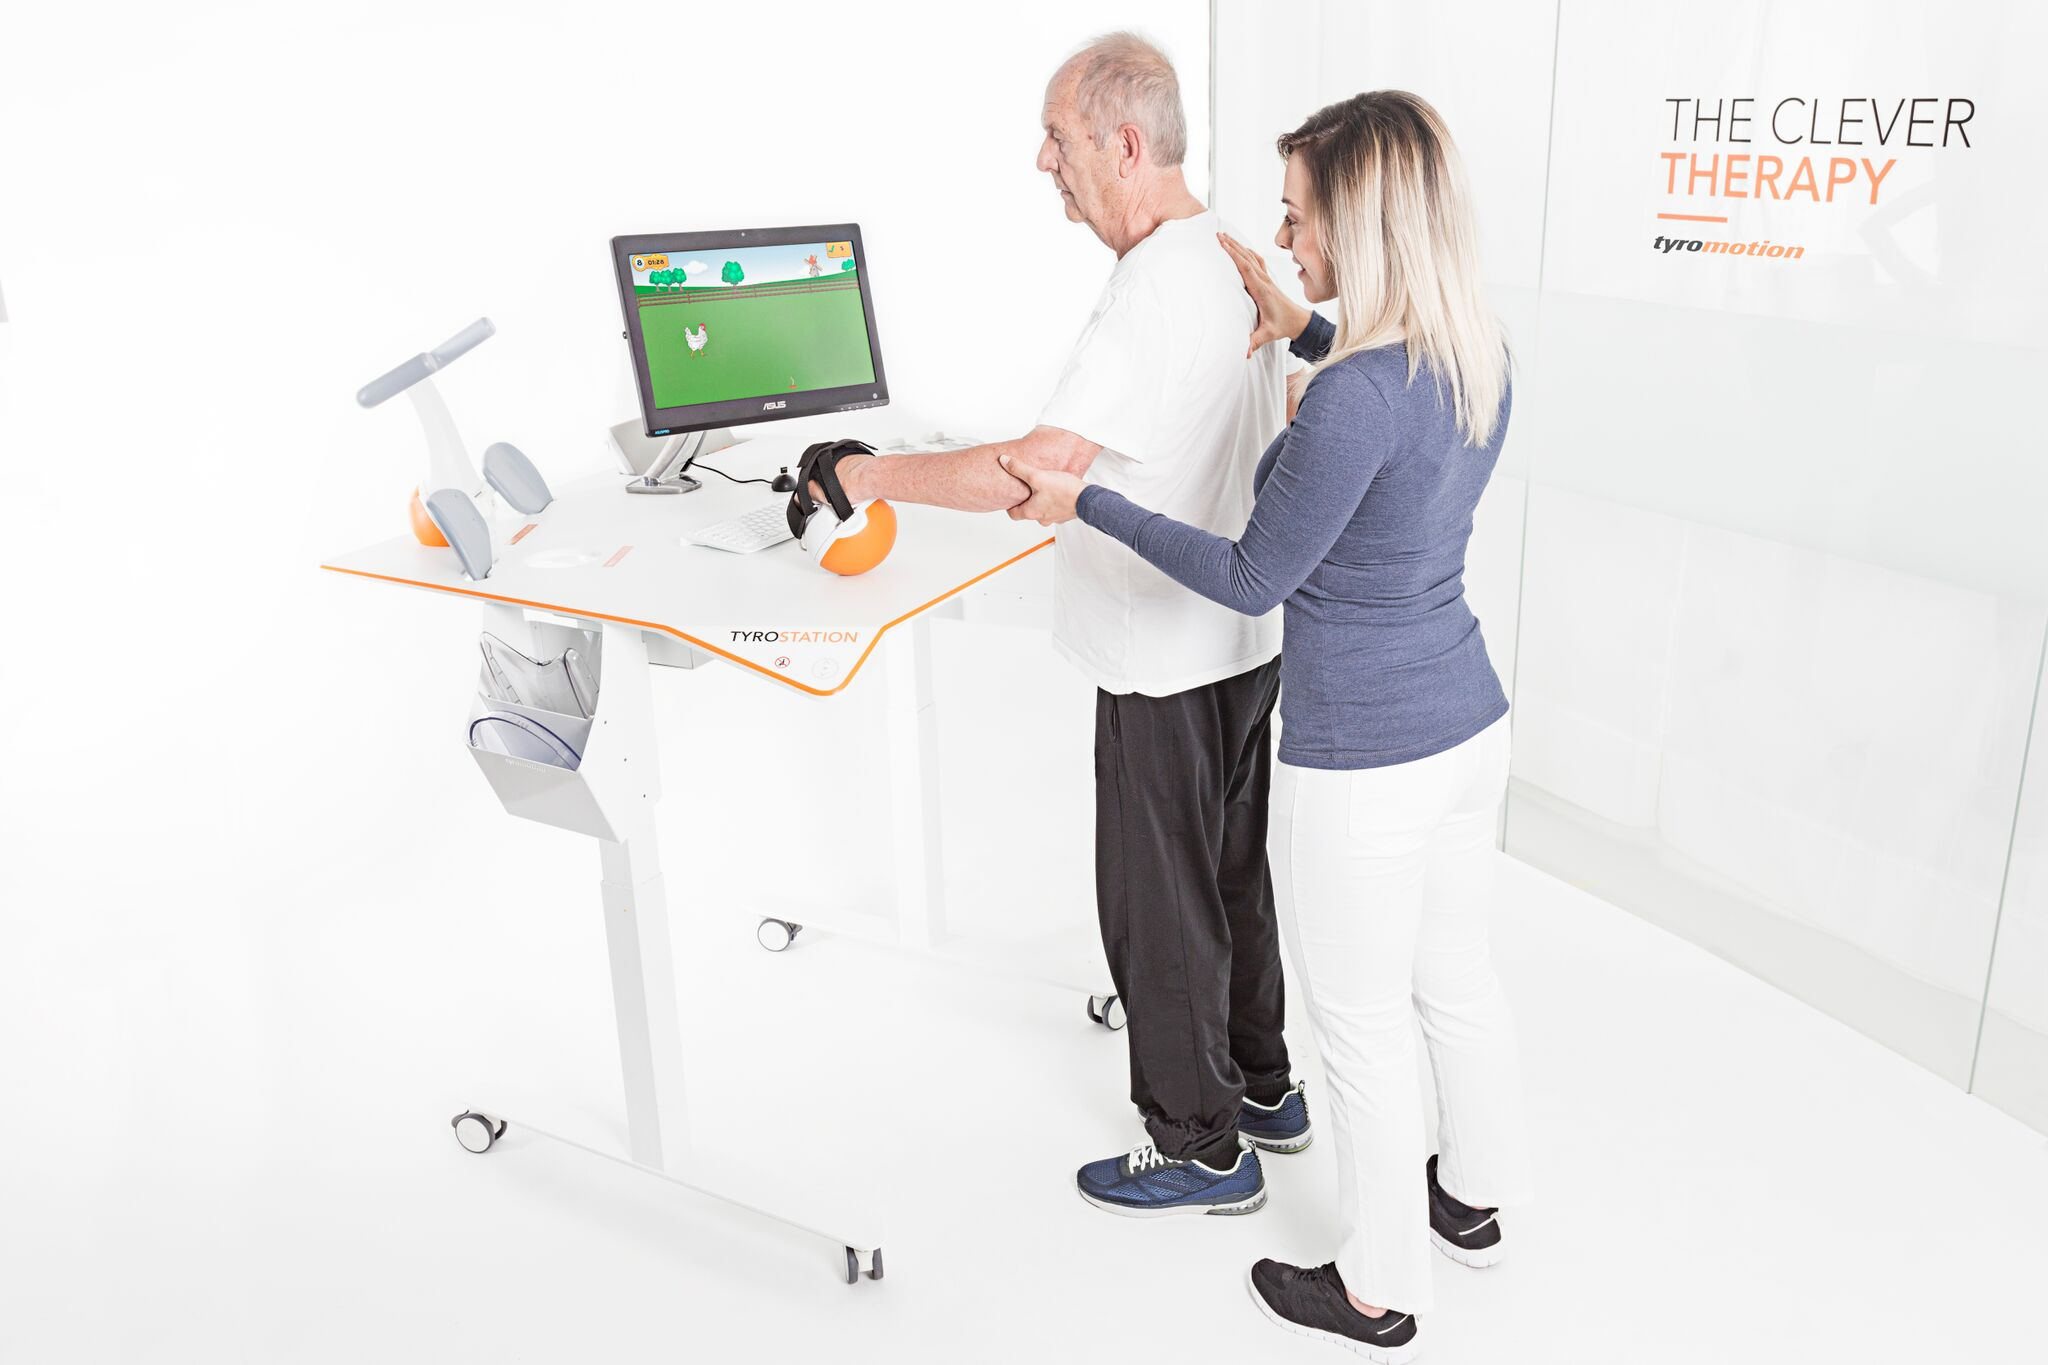 040520e2d19 Pablo | Multifunktionel rehabiliering | Fysiodema